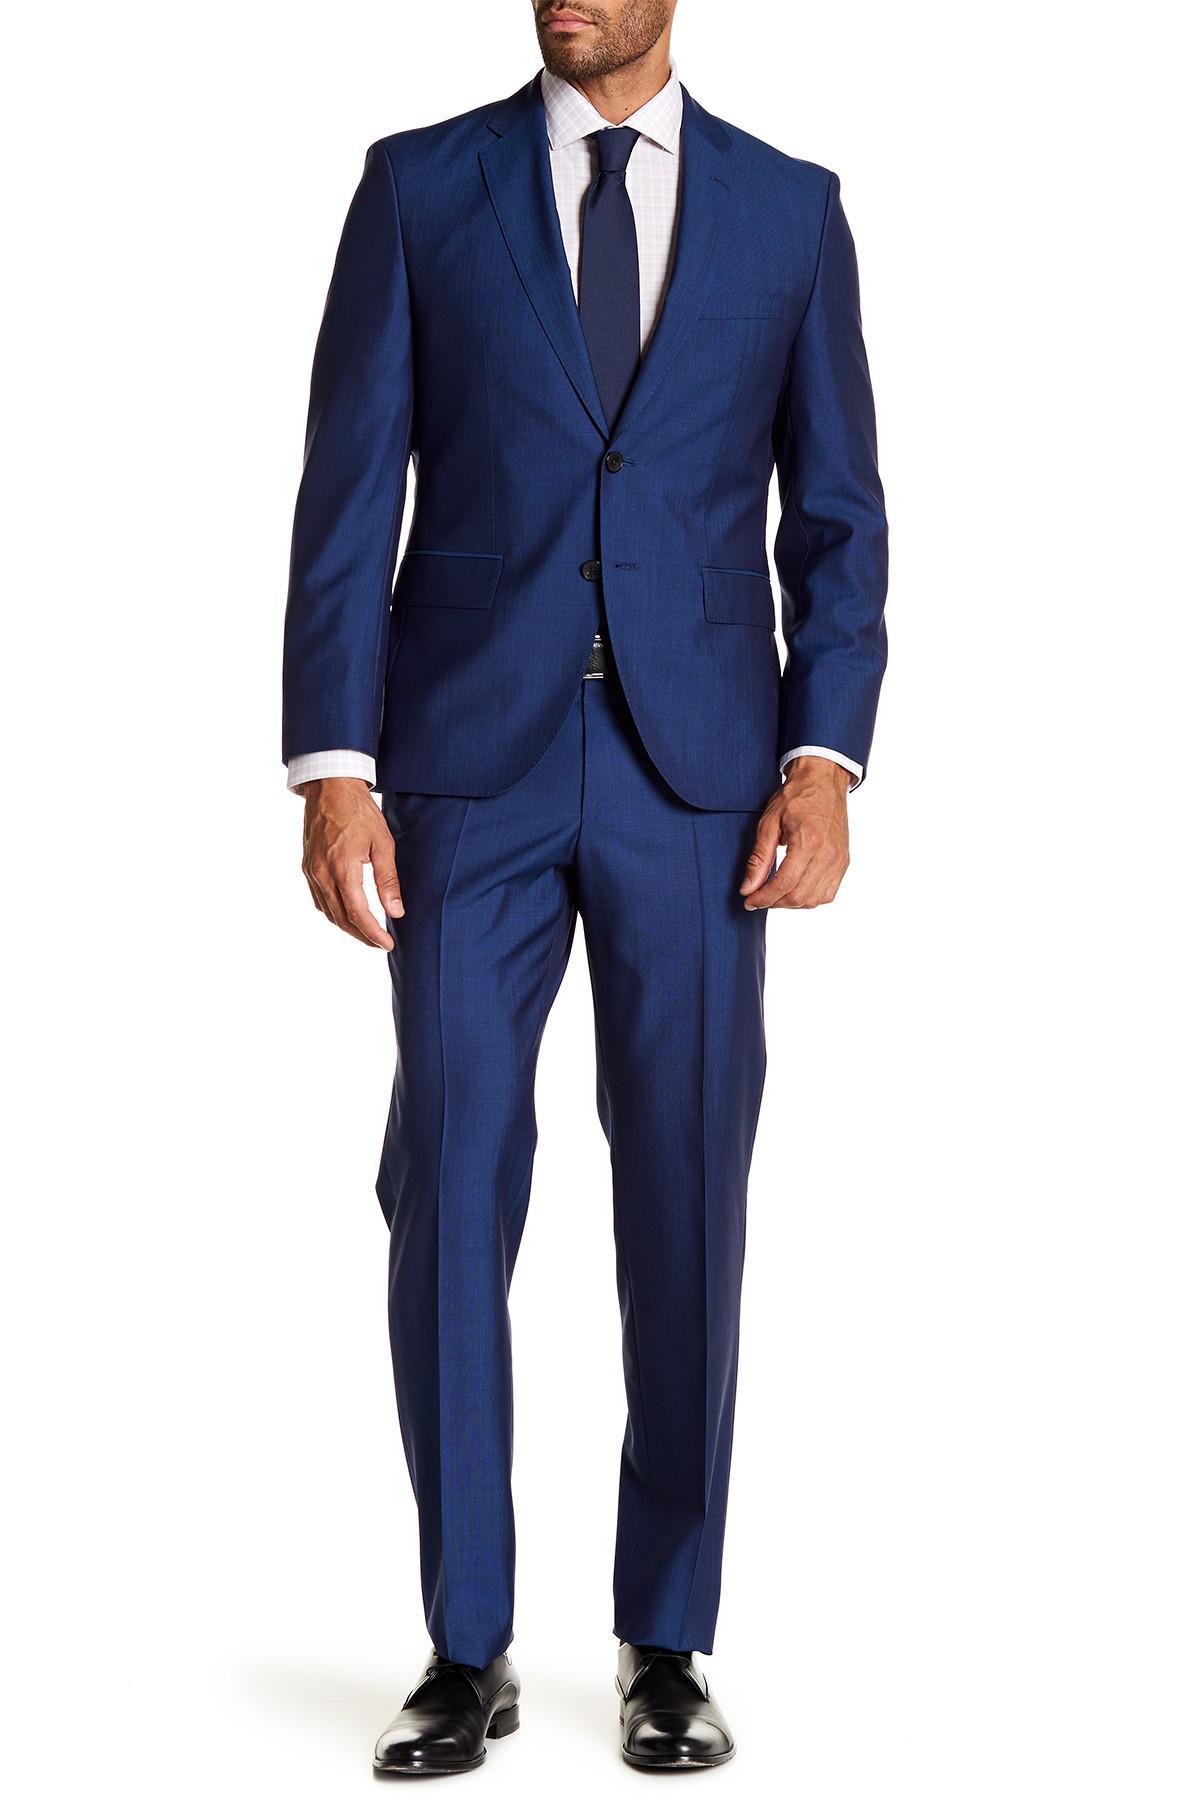 8abc9f68e BOSS Johnston's Lenon Medium Blue Two Button Notch Lapel Suit in ...